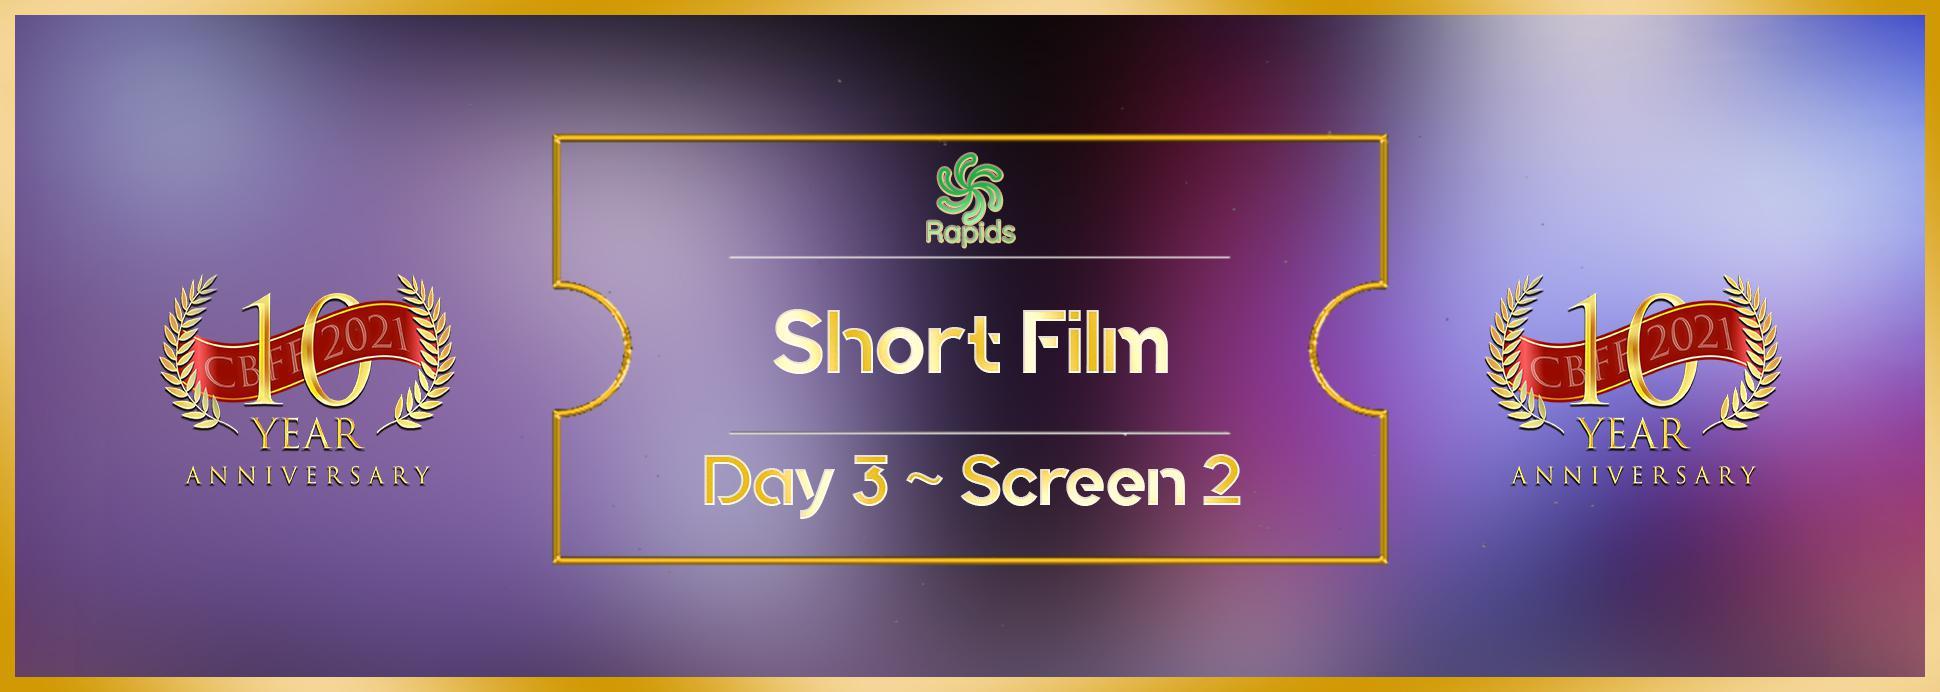 Day 3, Screen 2: Short Film